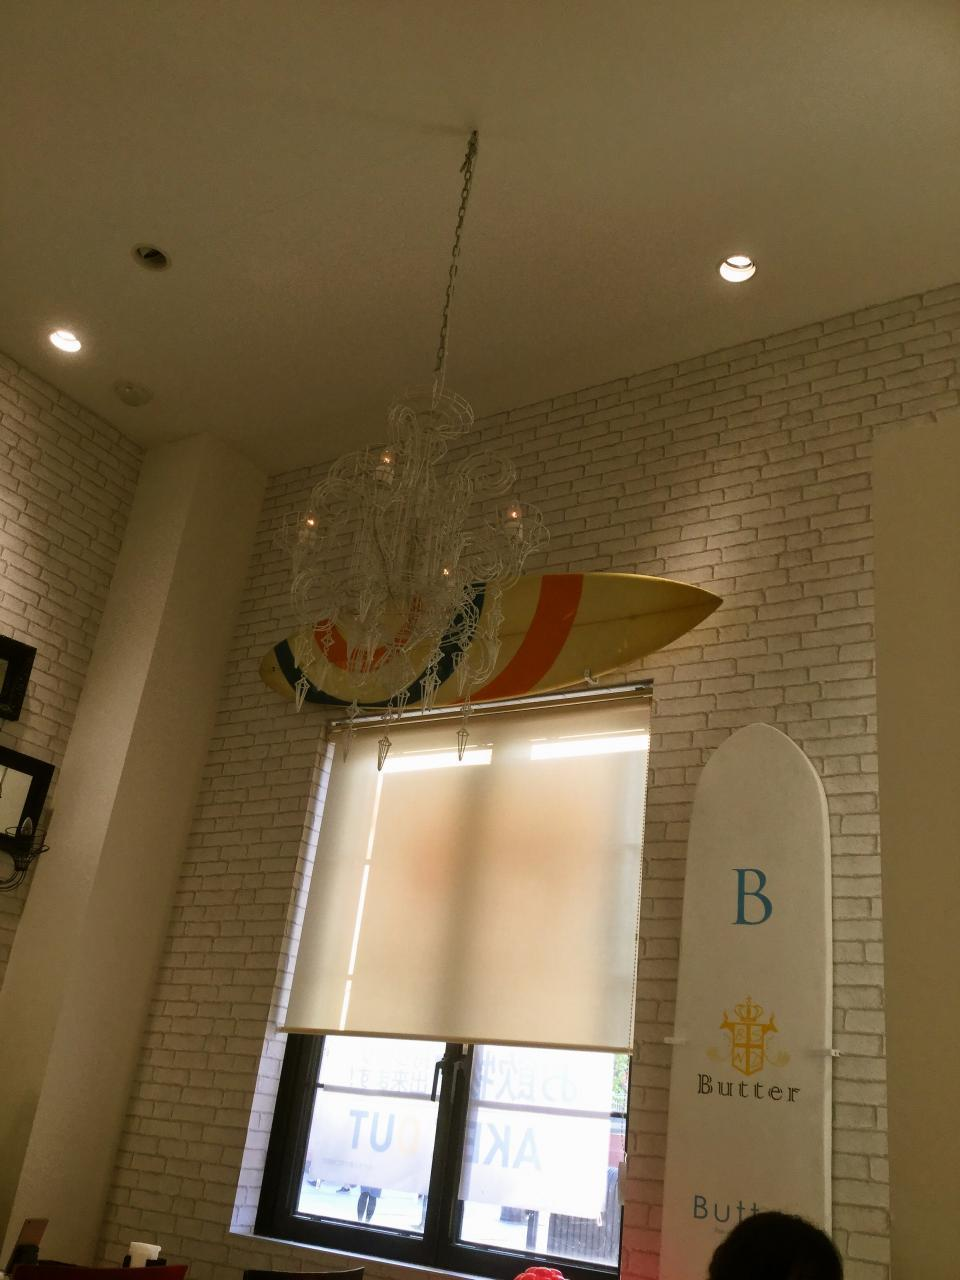 Butter 三井アウトレットパーク多摩南大沢(店内)